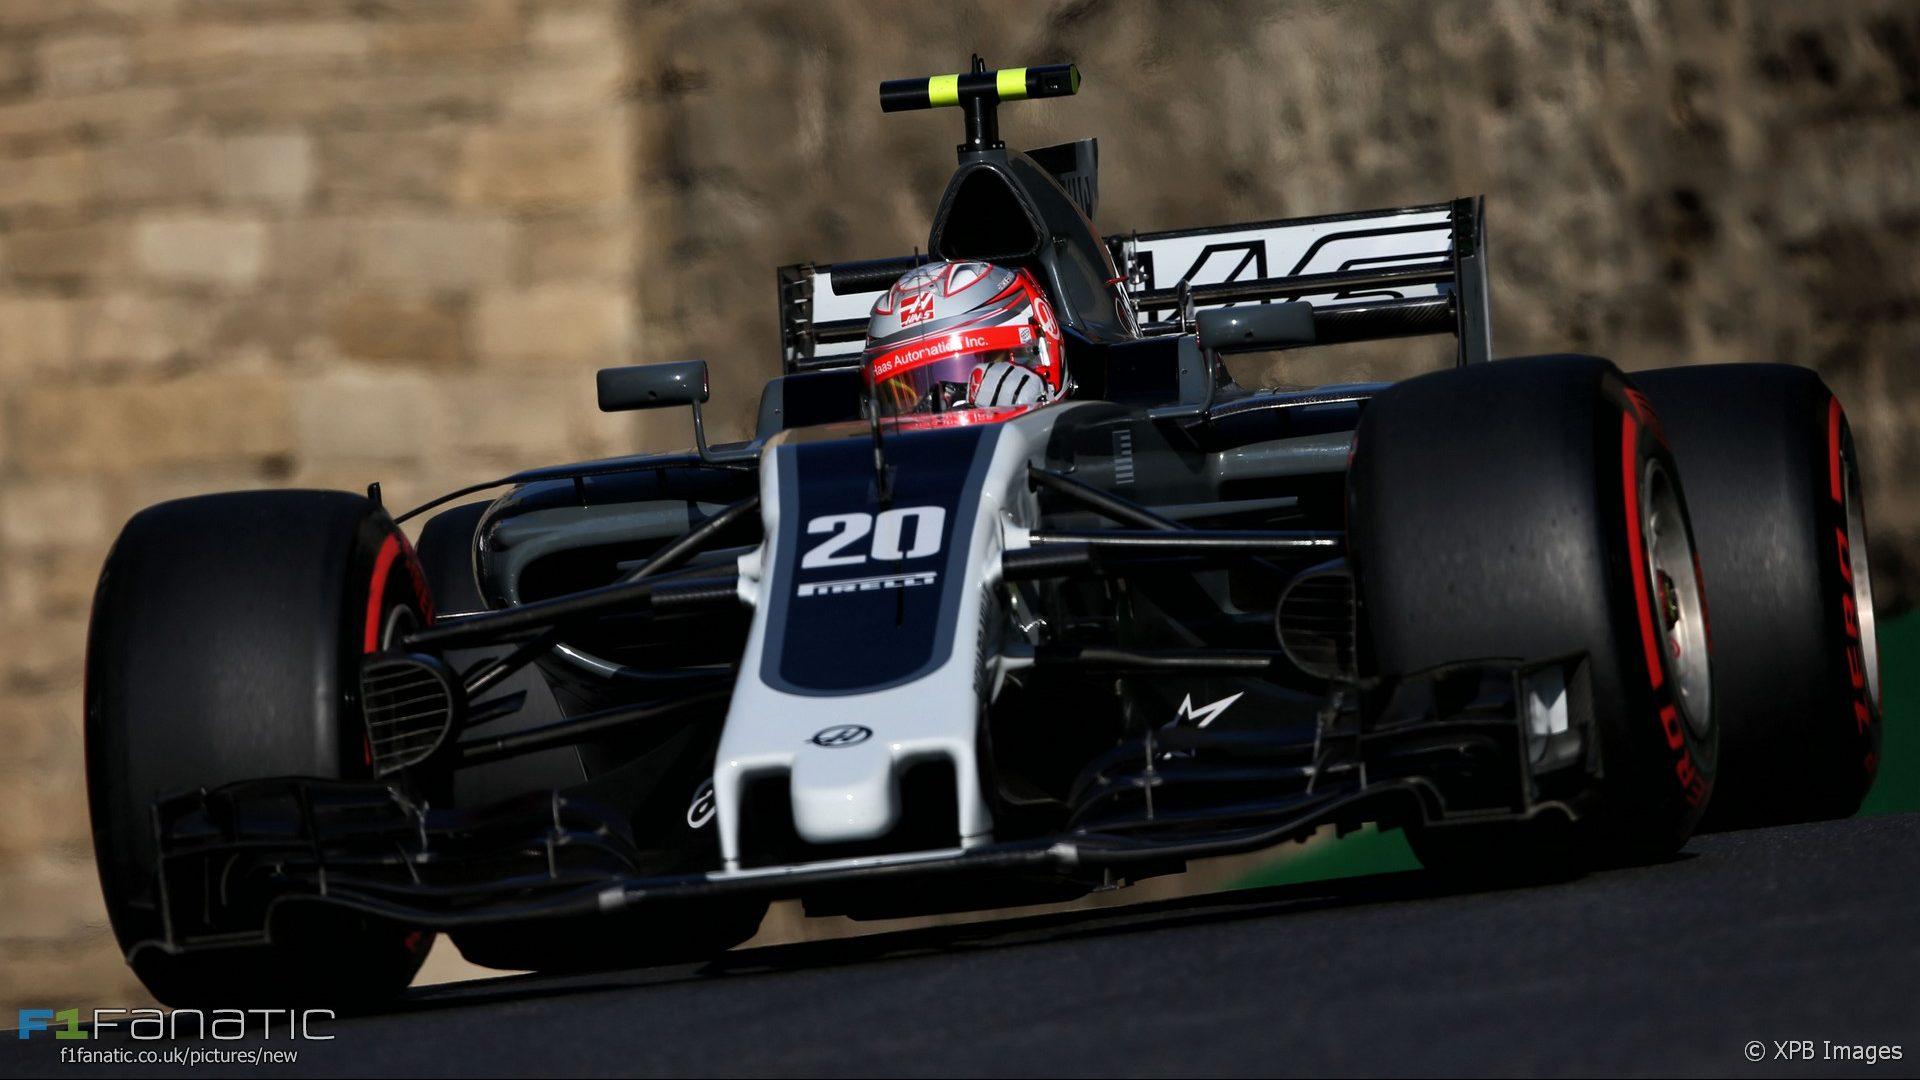 Kevin Magnussen, Haas, Baku City Circuit, 2017